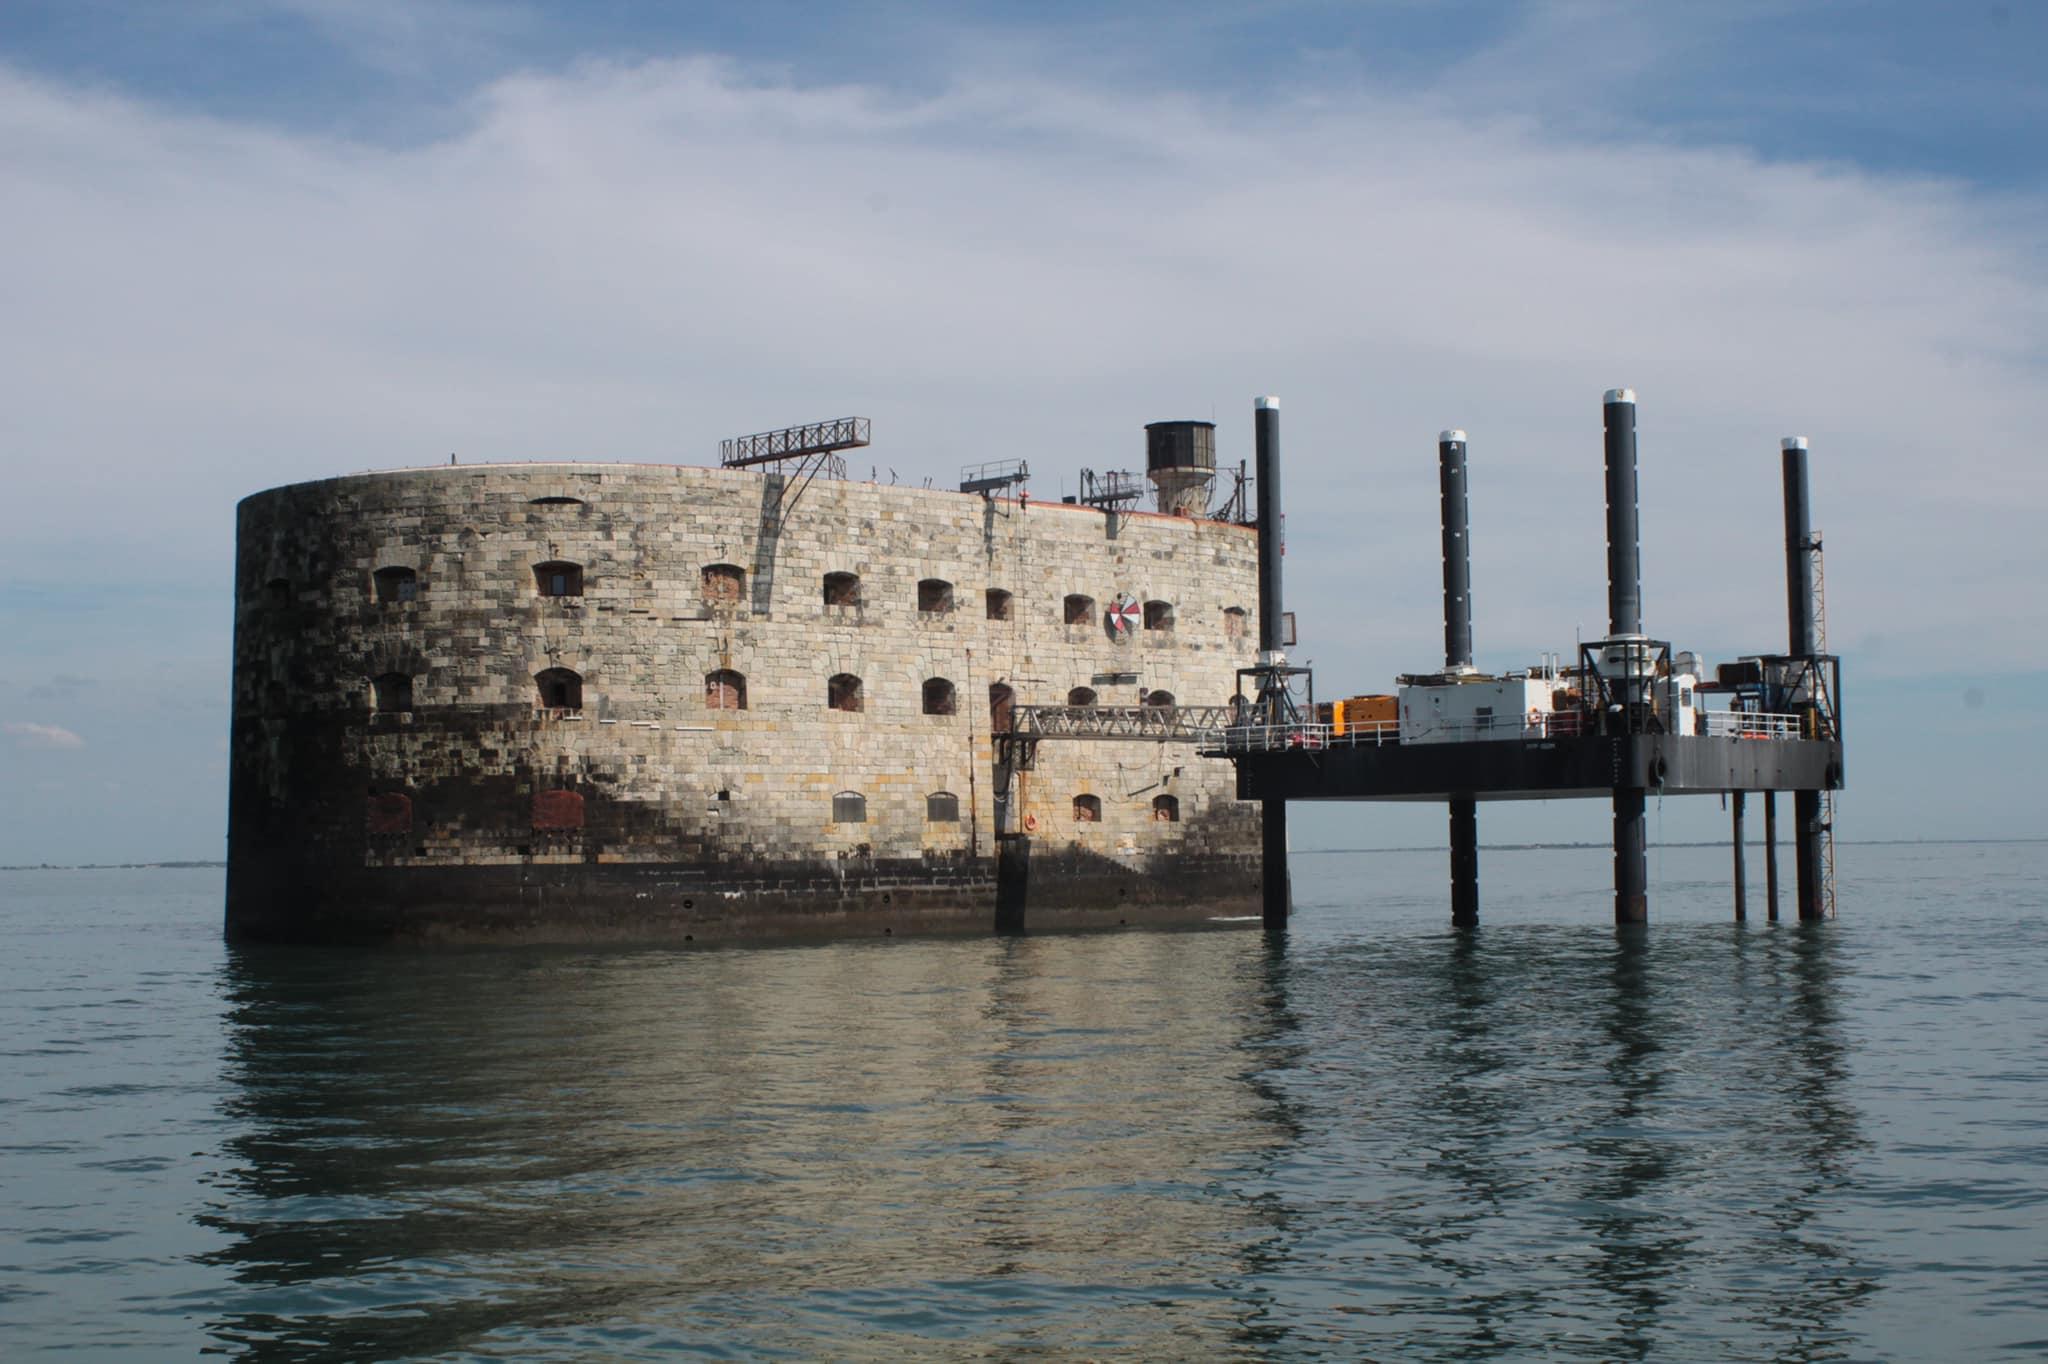 Photos des tournages Fort Boyard 2021 (production + candidats) - Page 6 18358910